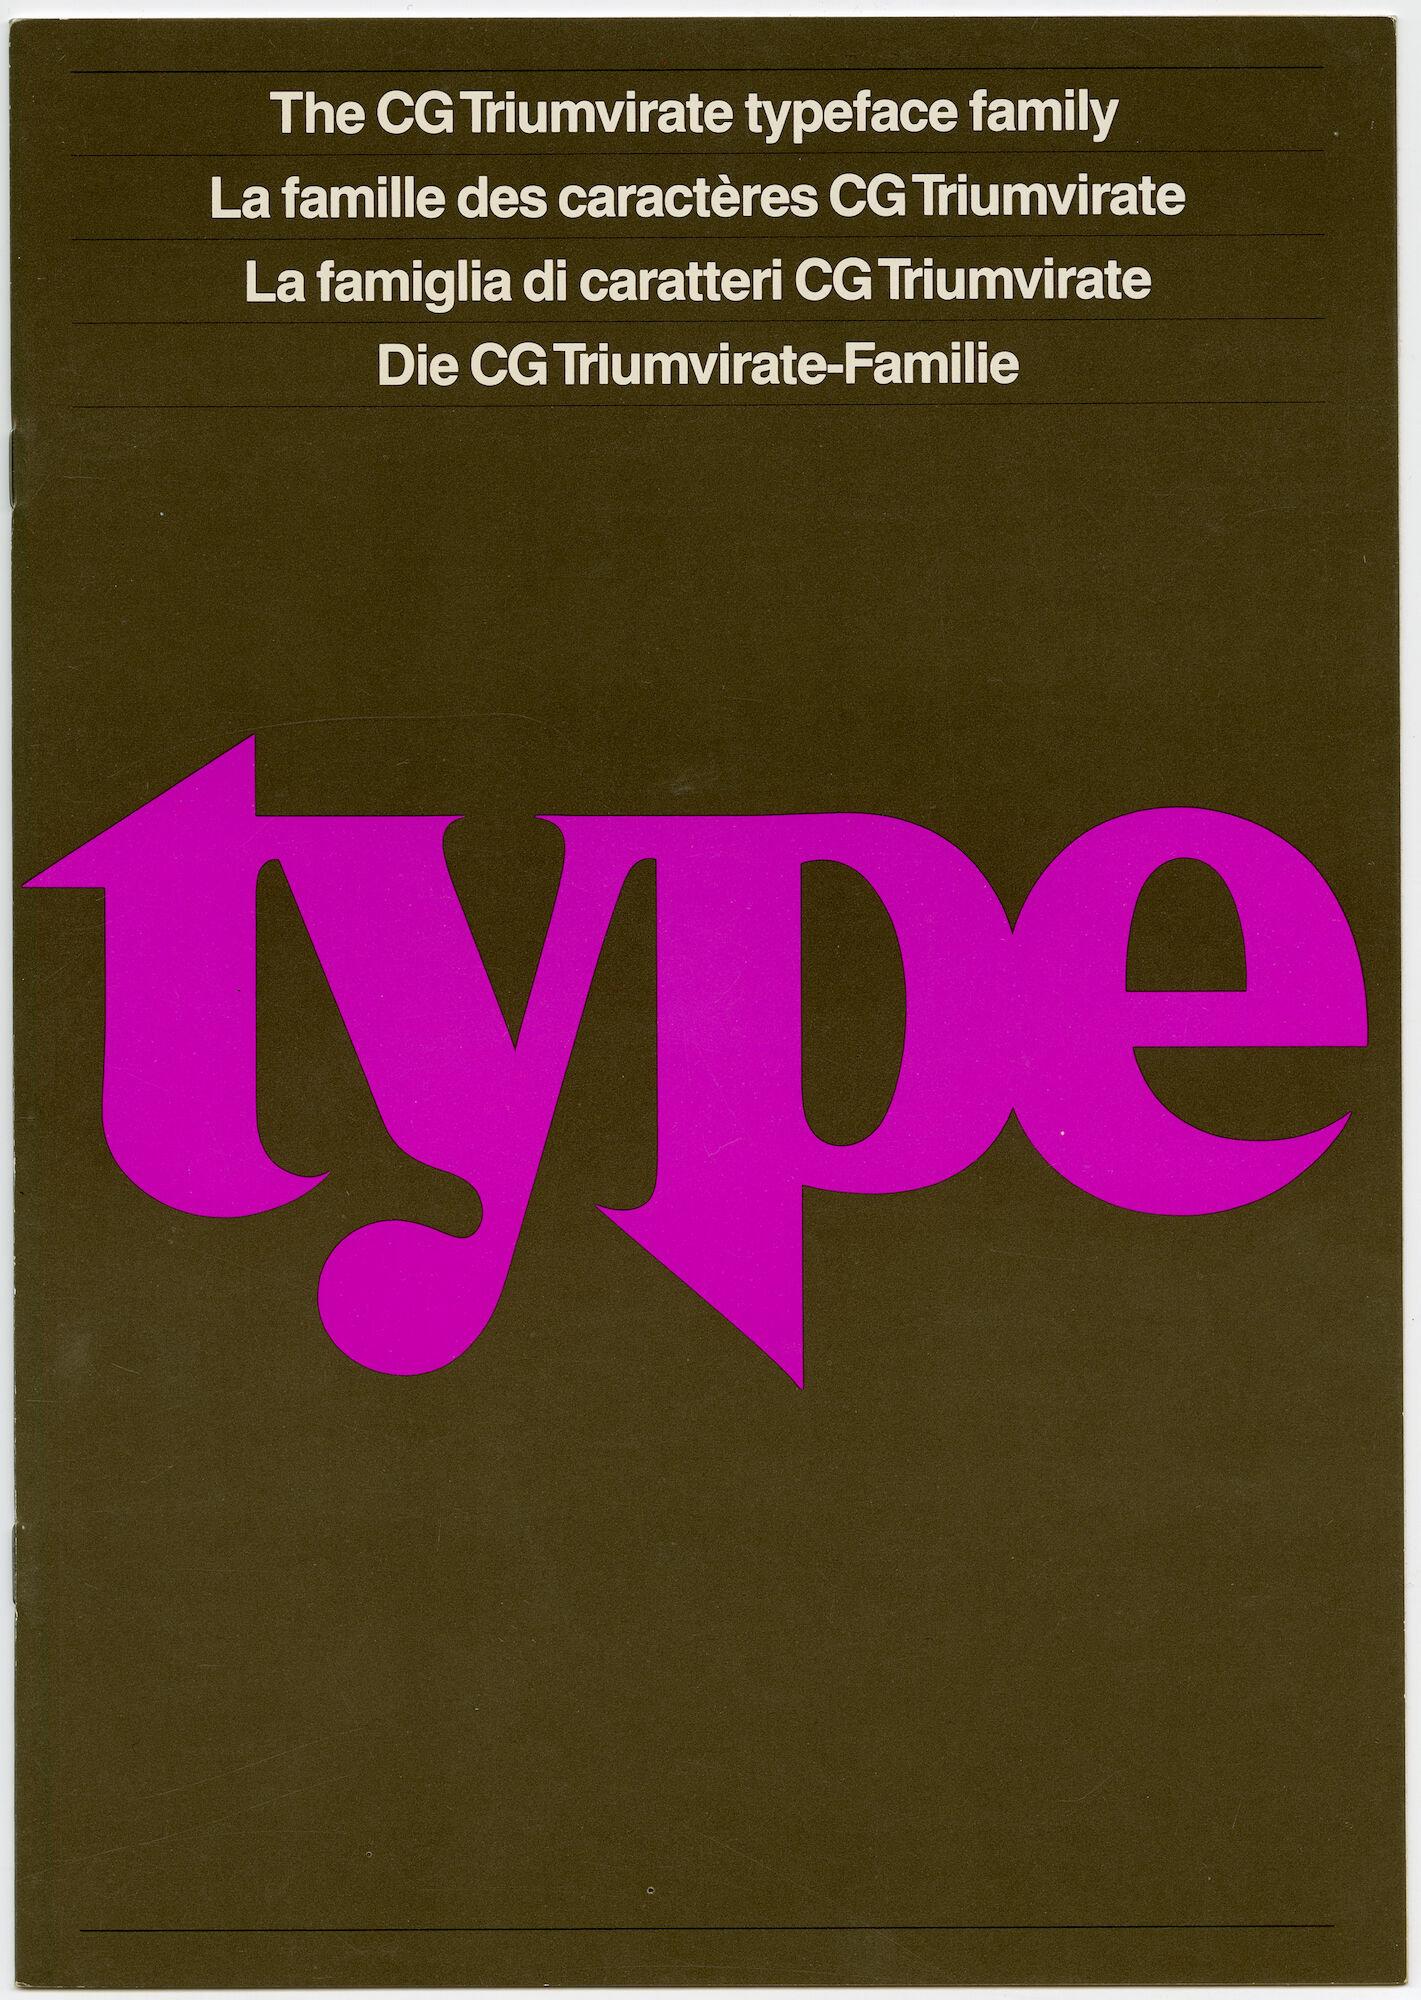 Letterproef met lettertypes van de familie CG Triumvirate